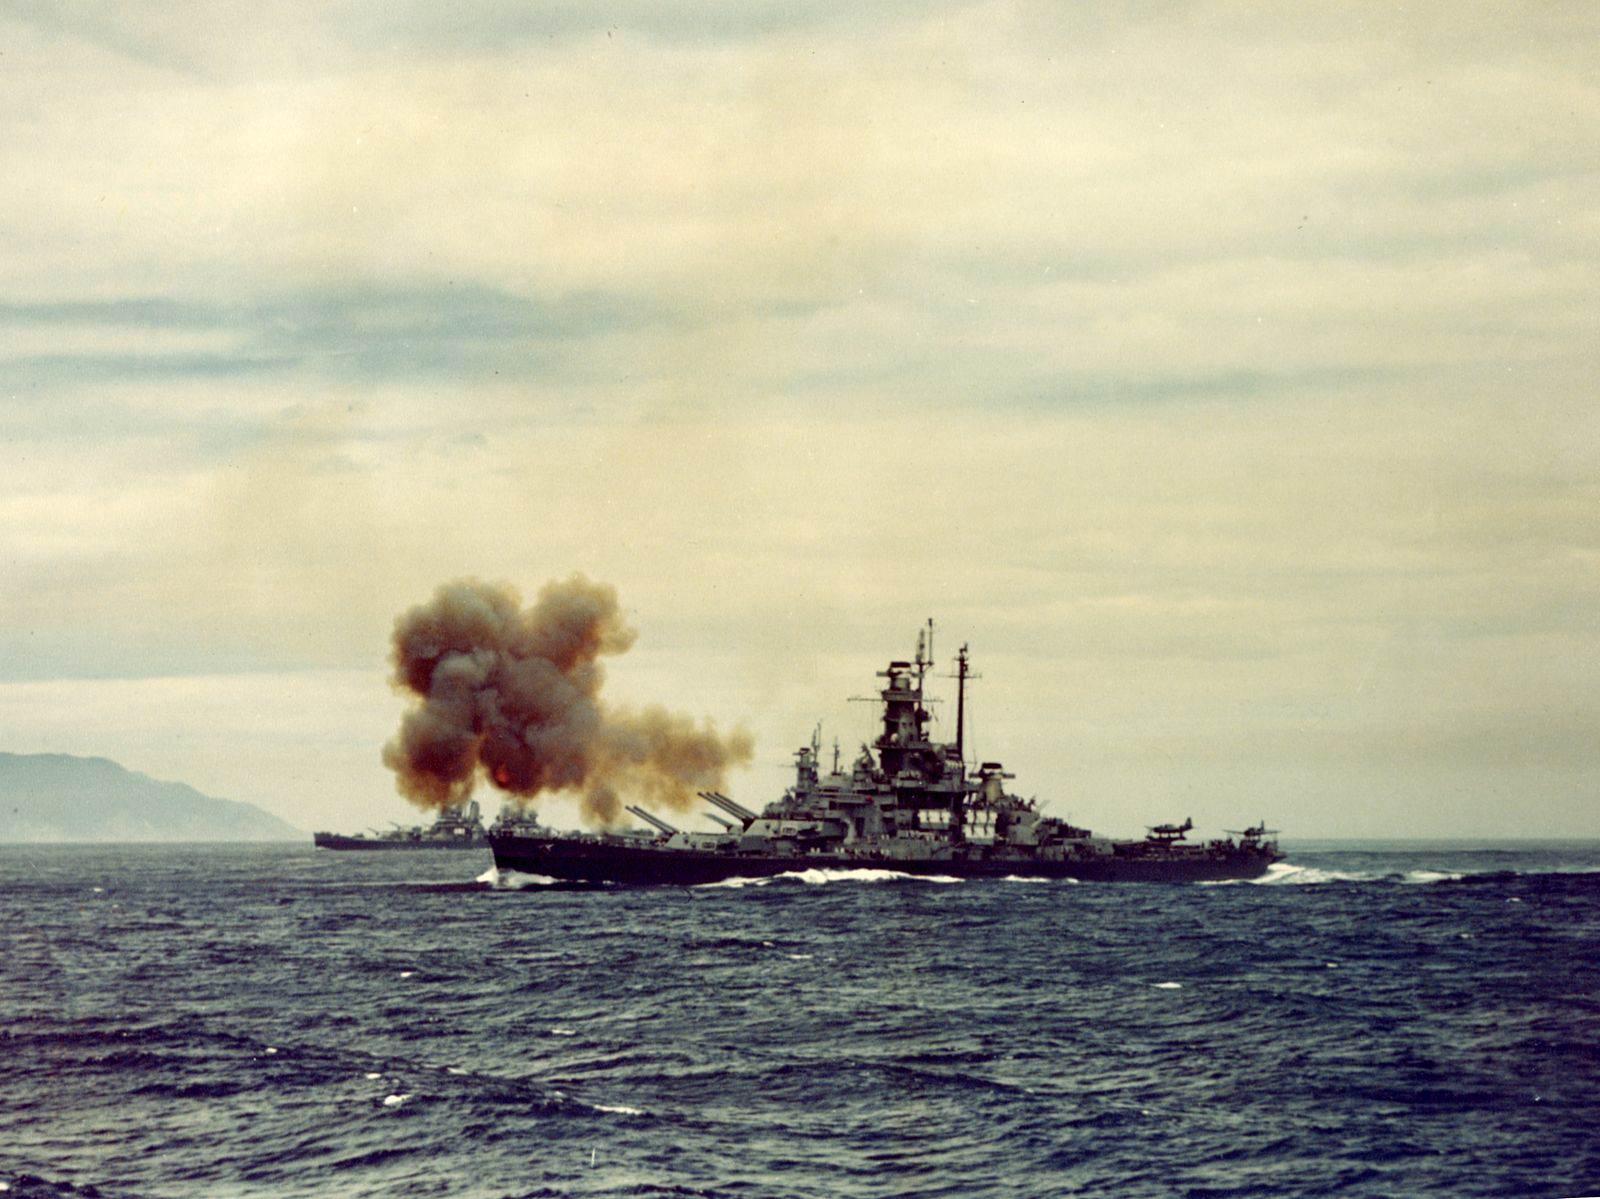 USS Indiana bombarding Kamaishi 14 July 1945 - Le USS Indiana fait feu sur une usine de Kamaishi, à 400km de Tokyo